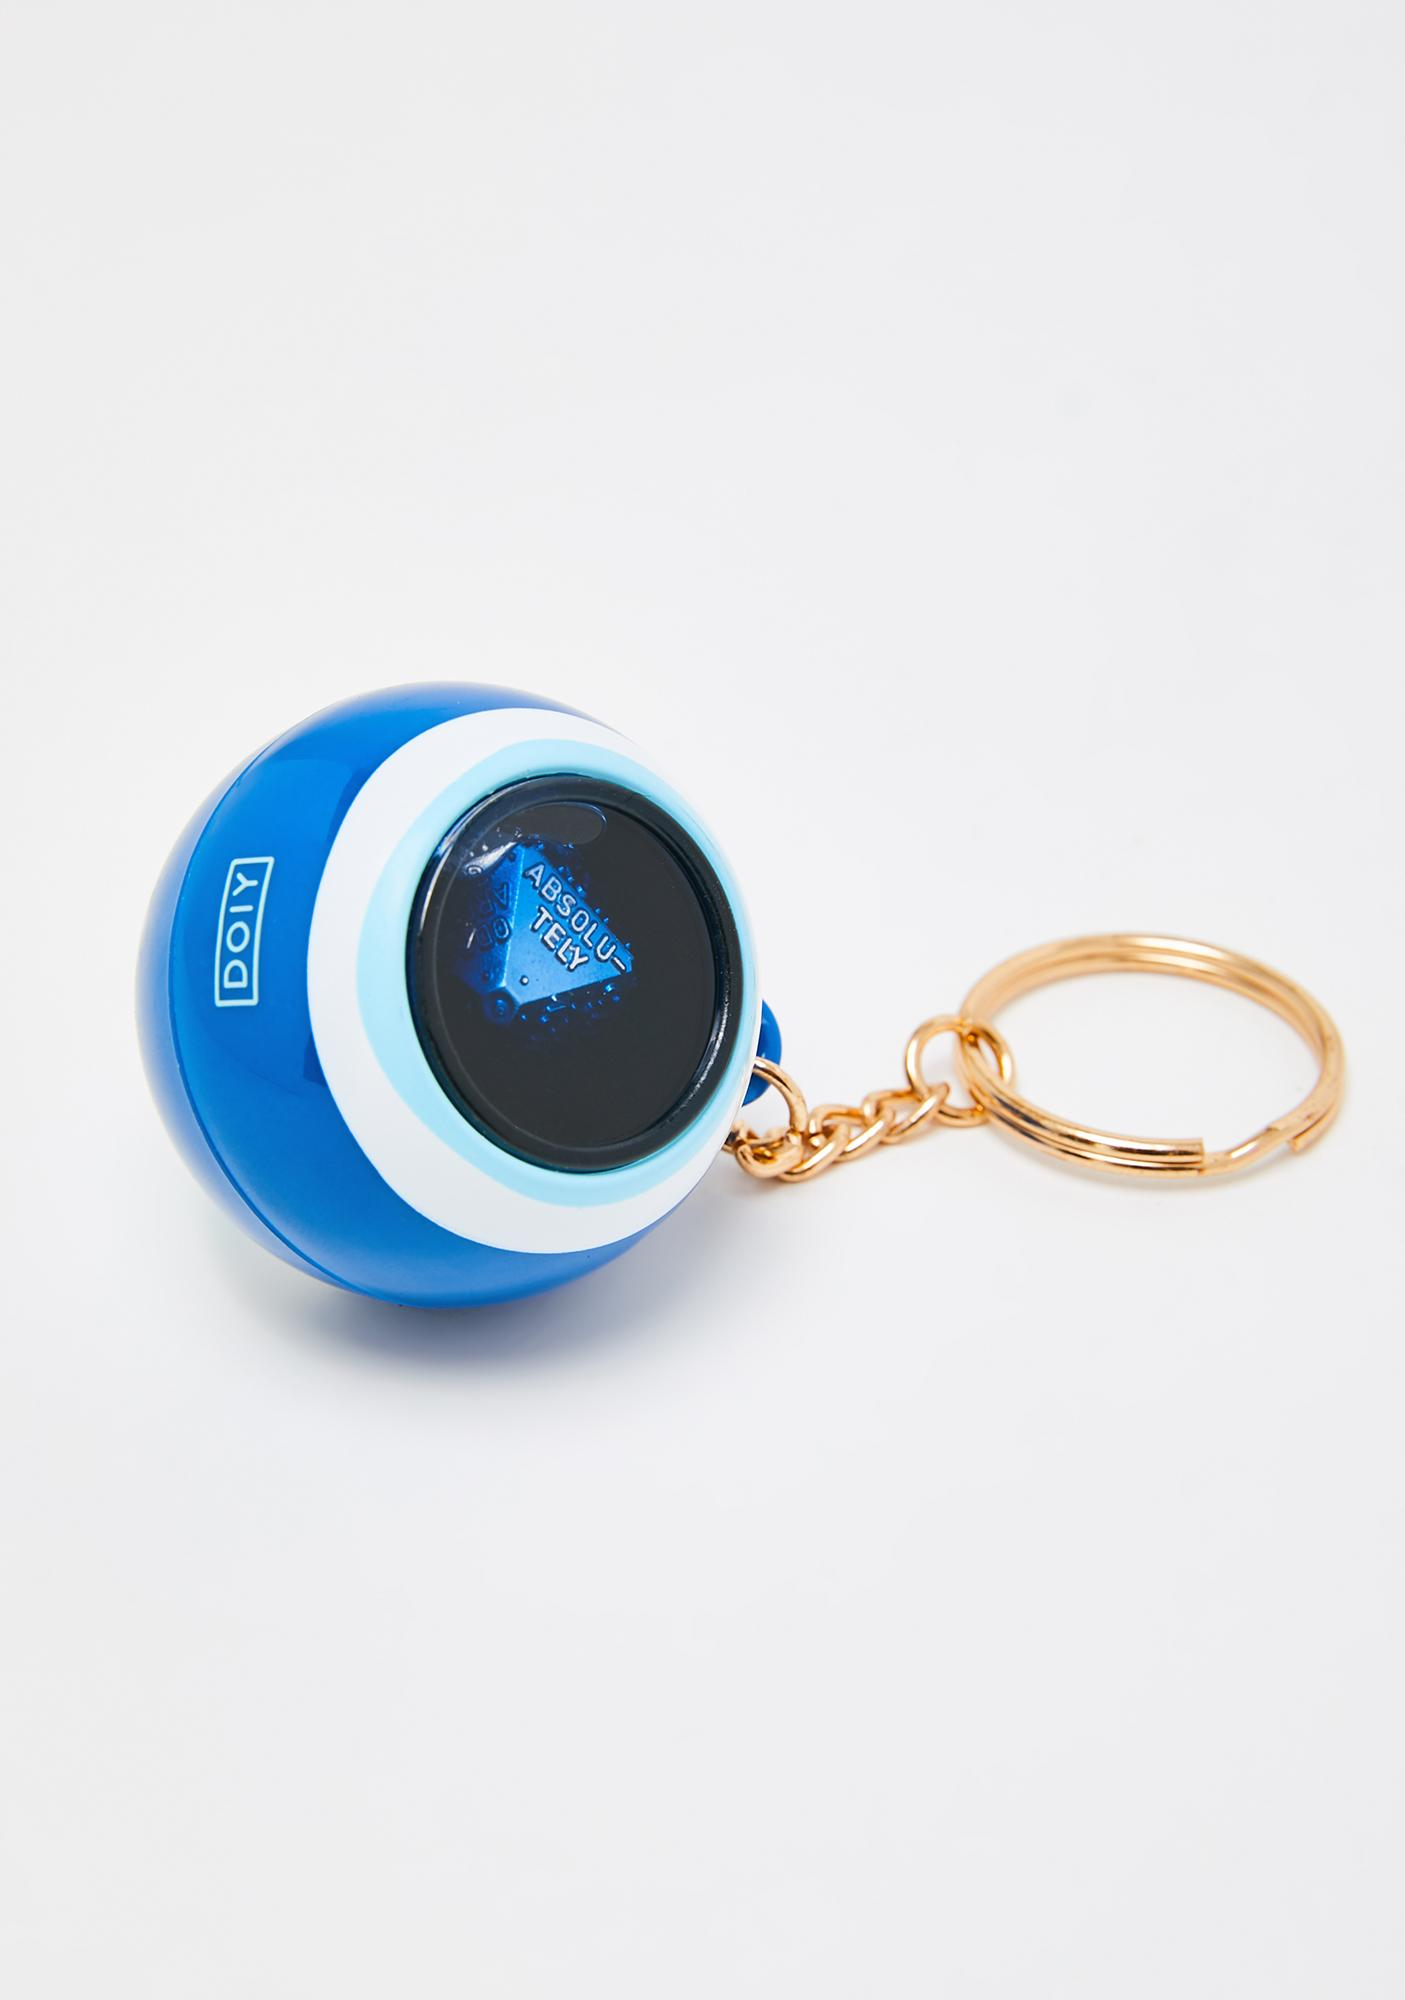 Seeing Evil Eye Keychain